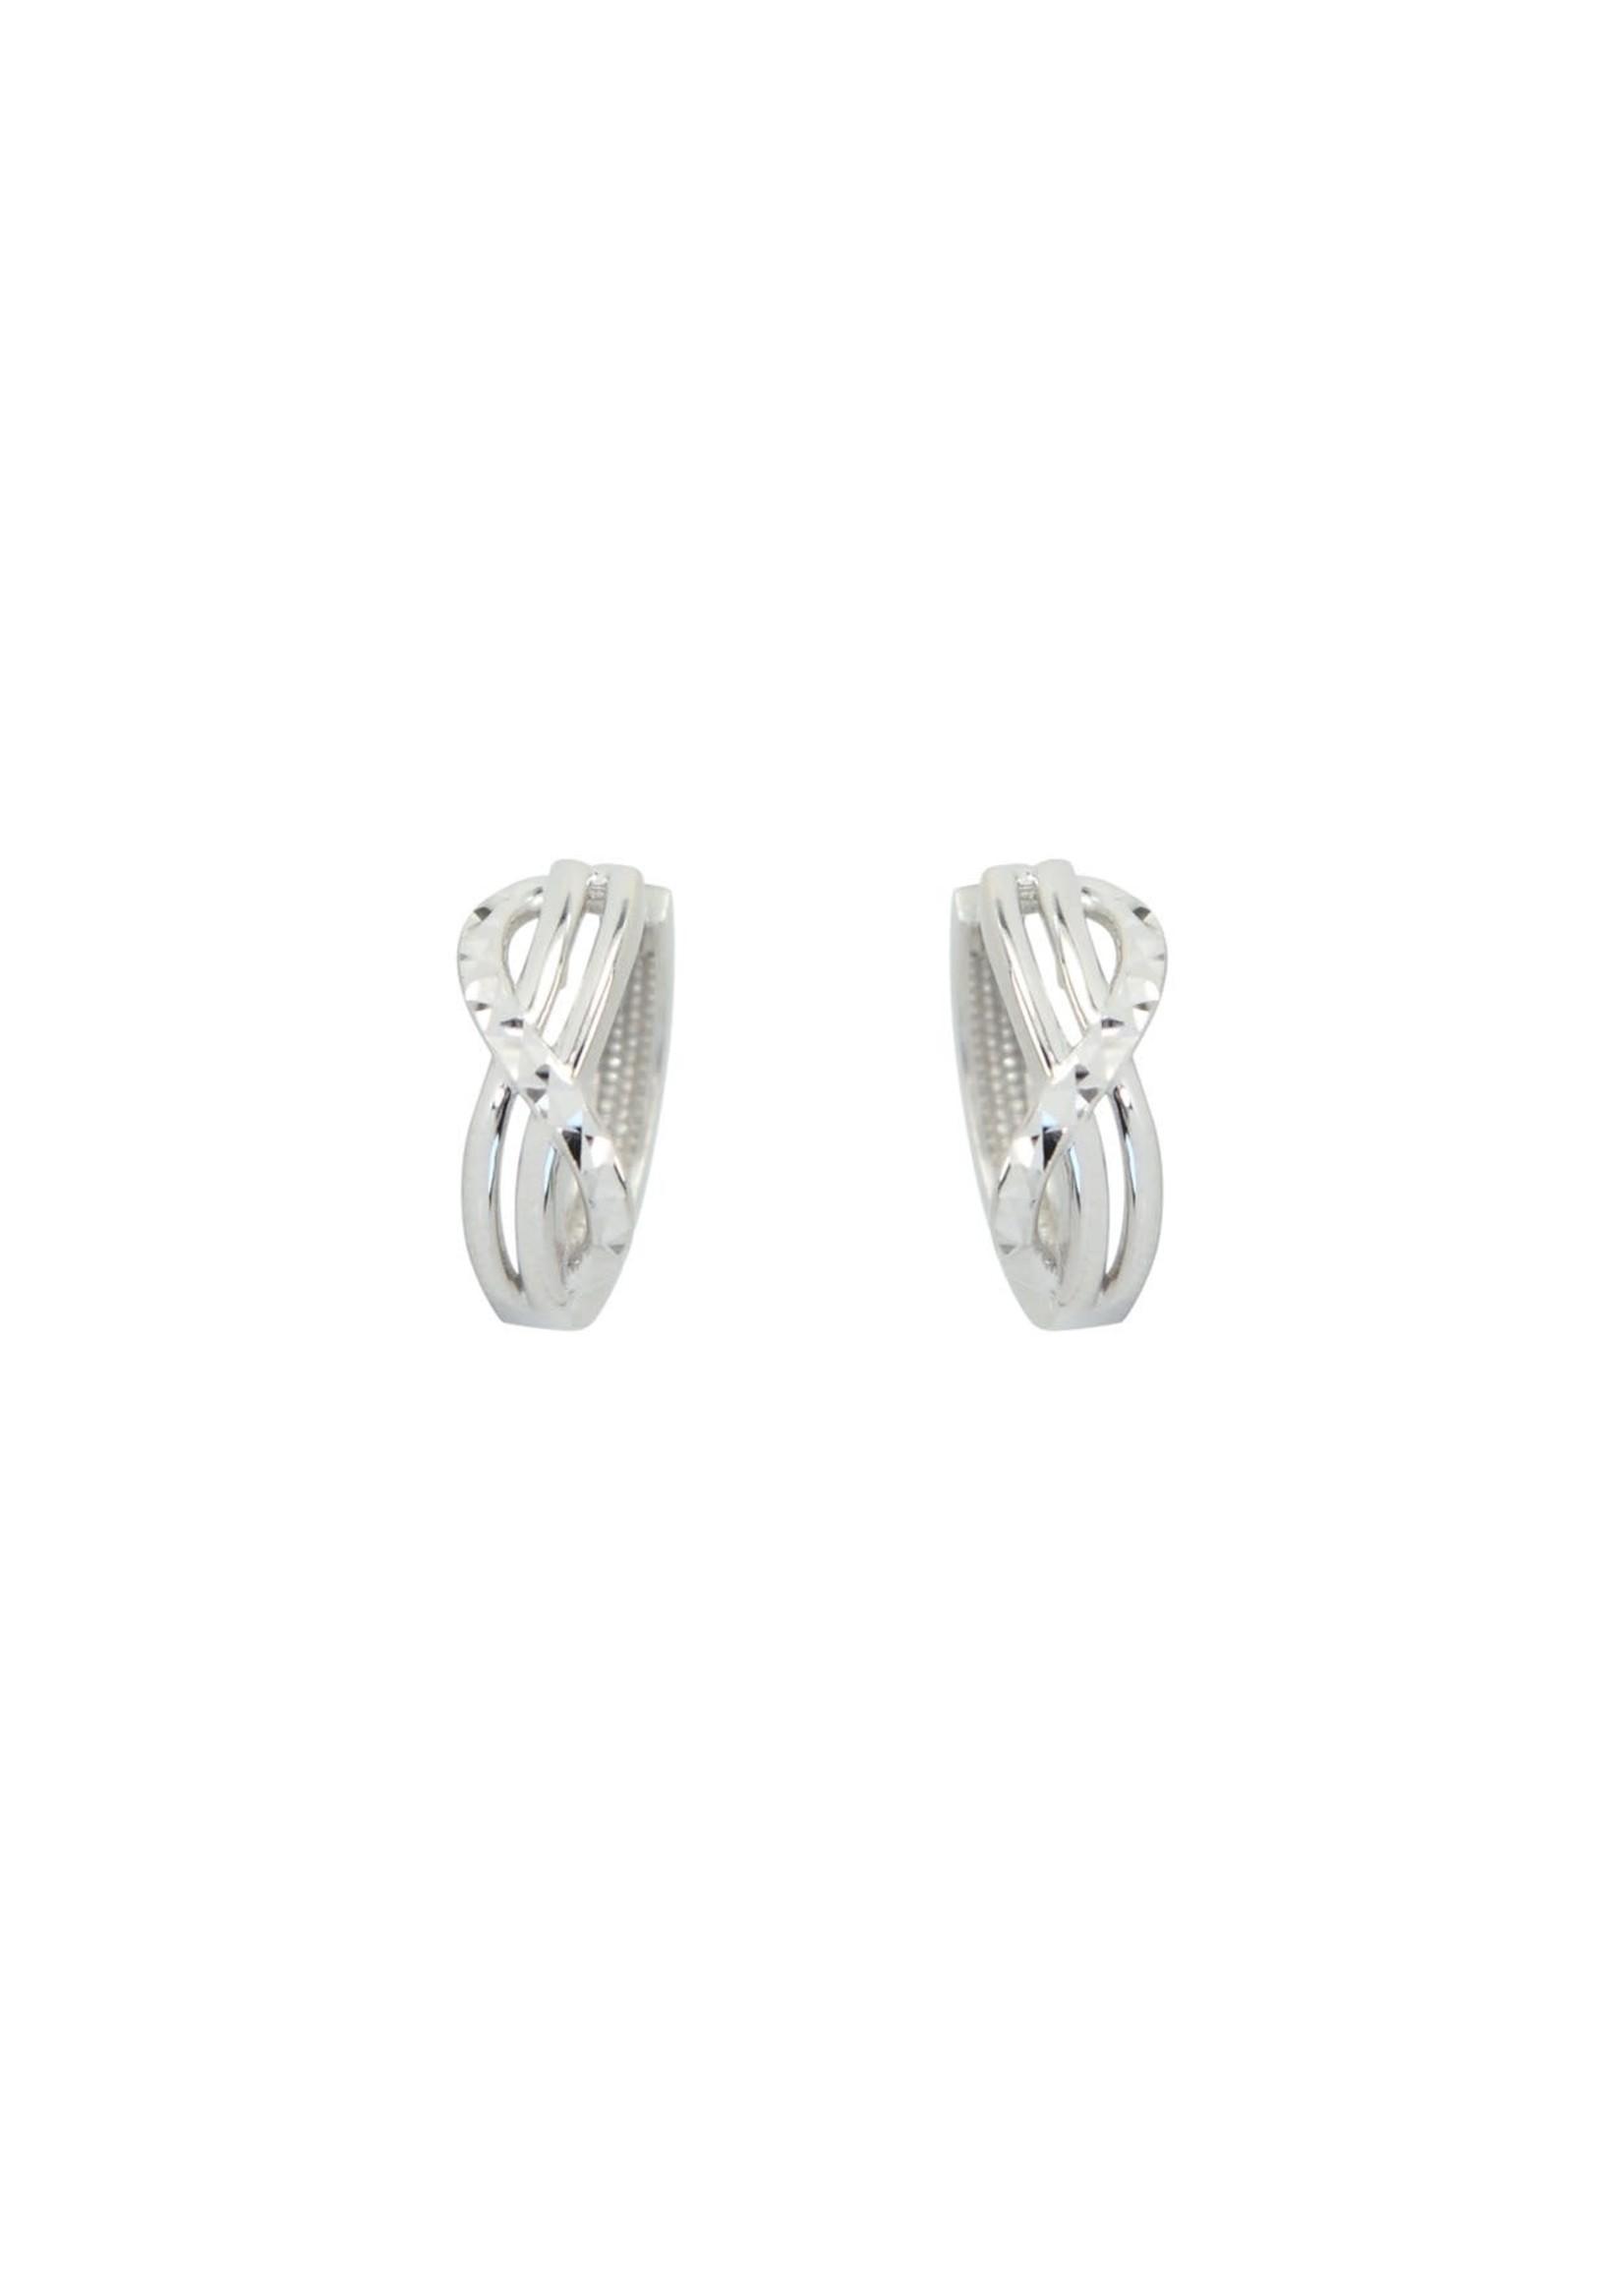 Boucles d'oreilles Infini Huggies Or blanc 10K